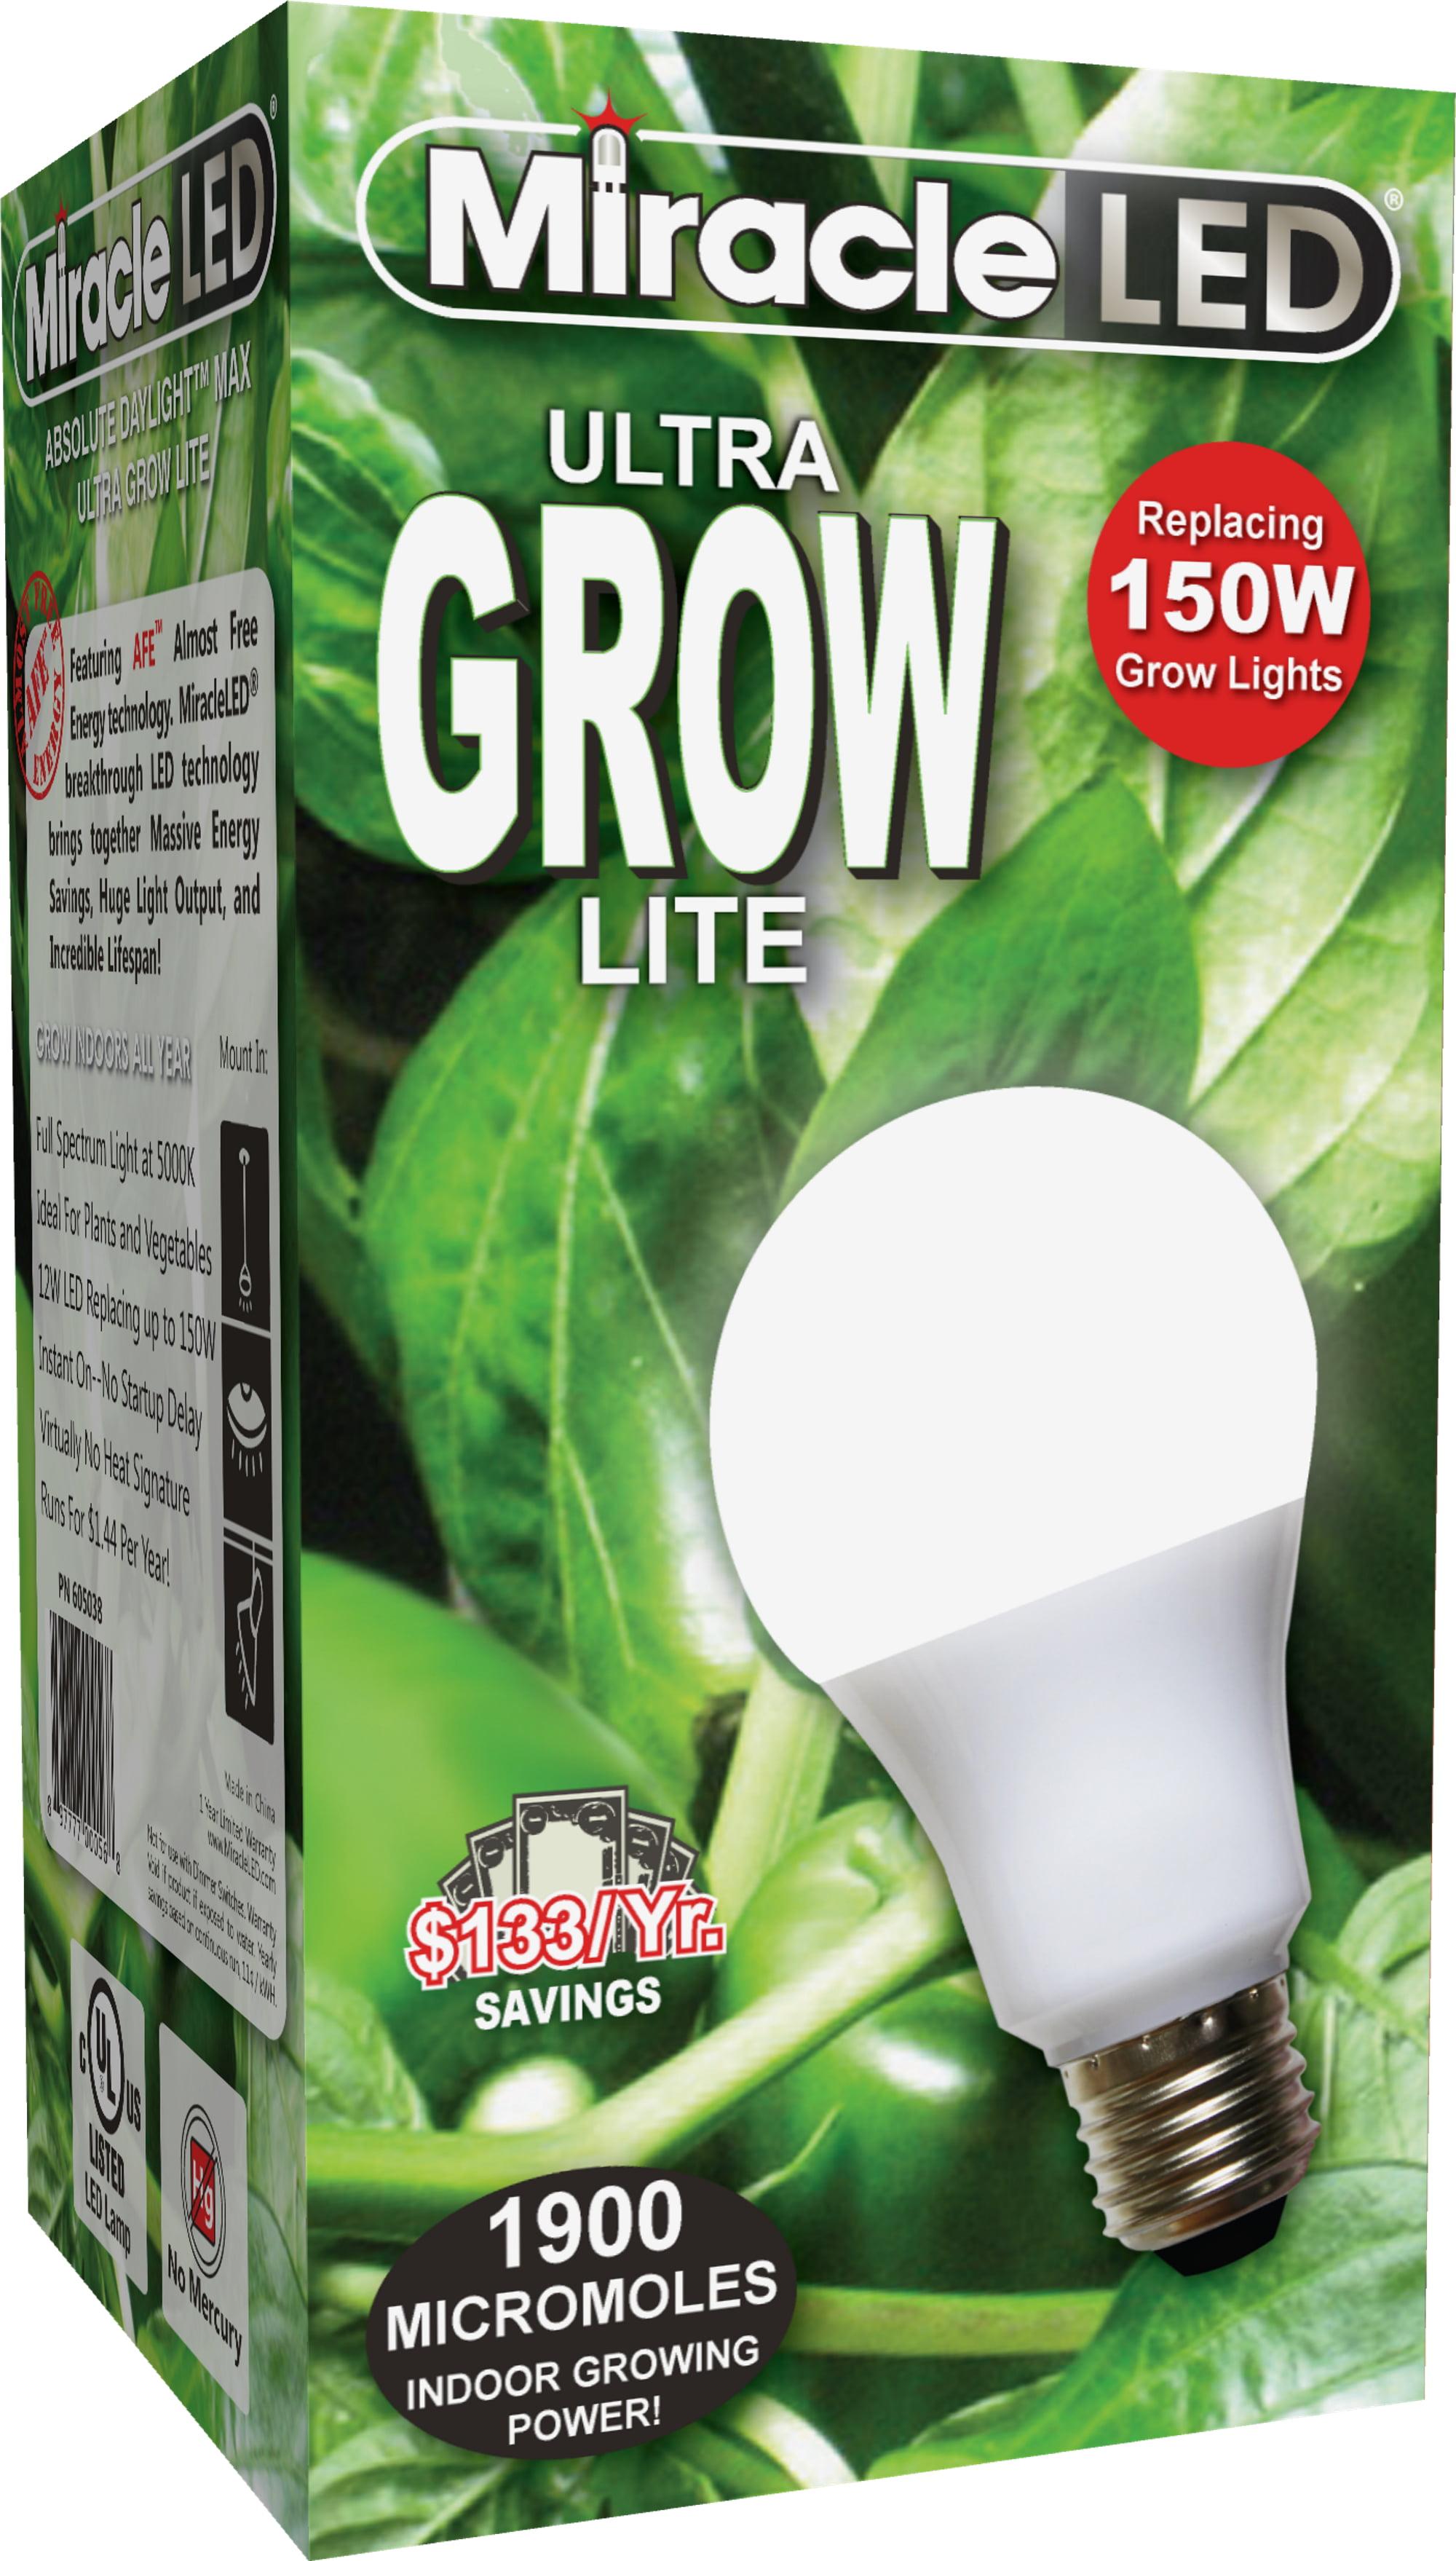 c6925c5e86f All Light Bulbs by Walmart.com